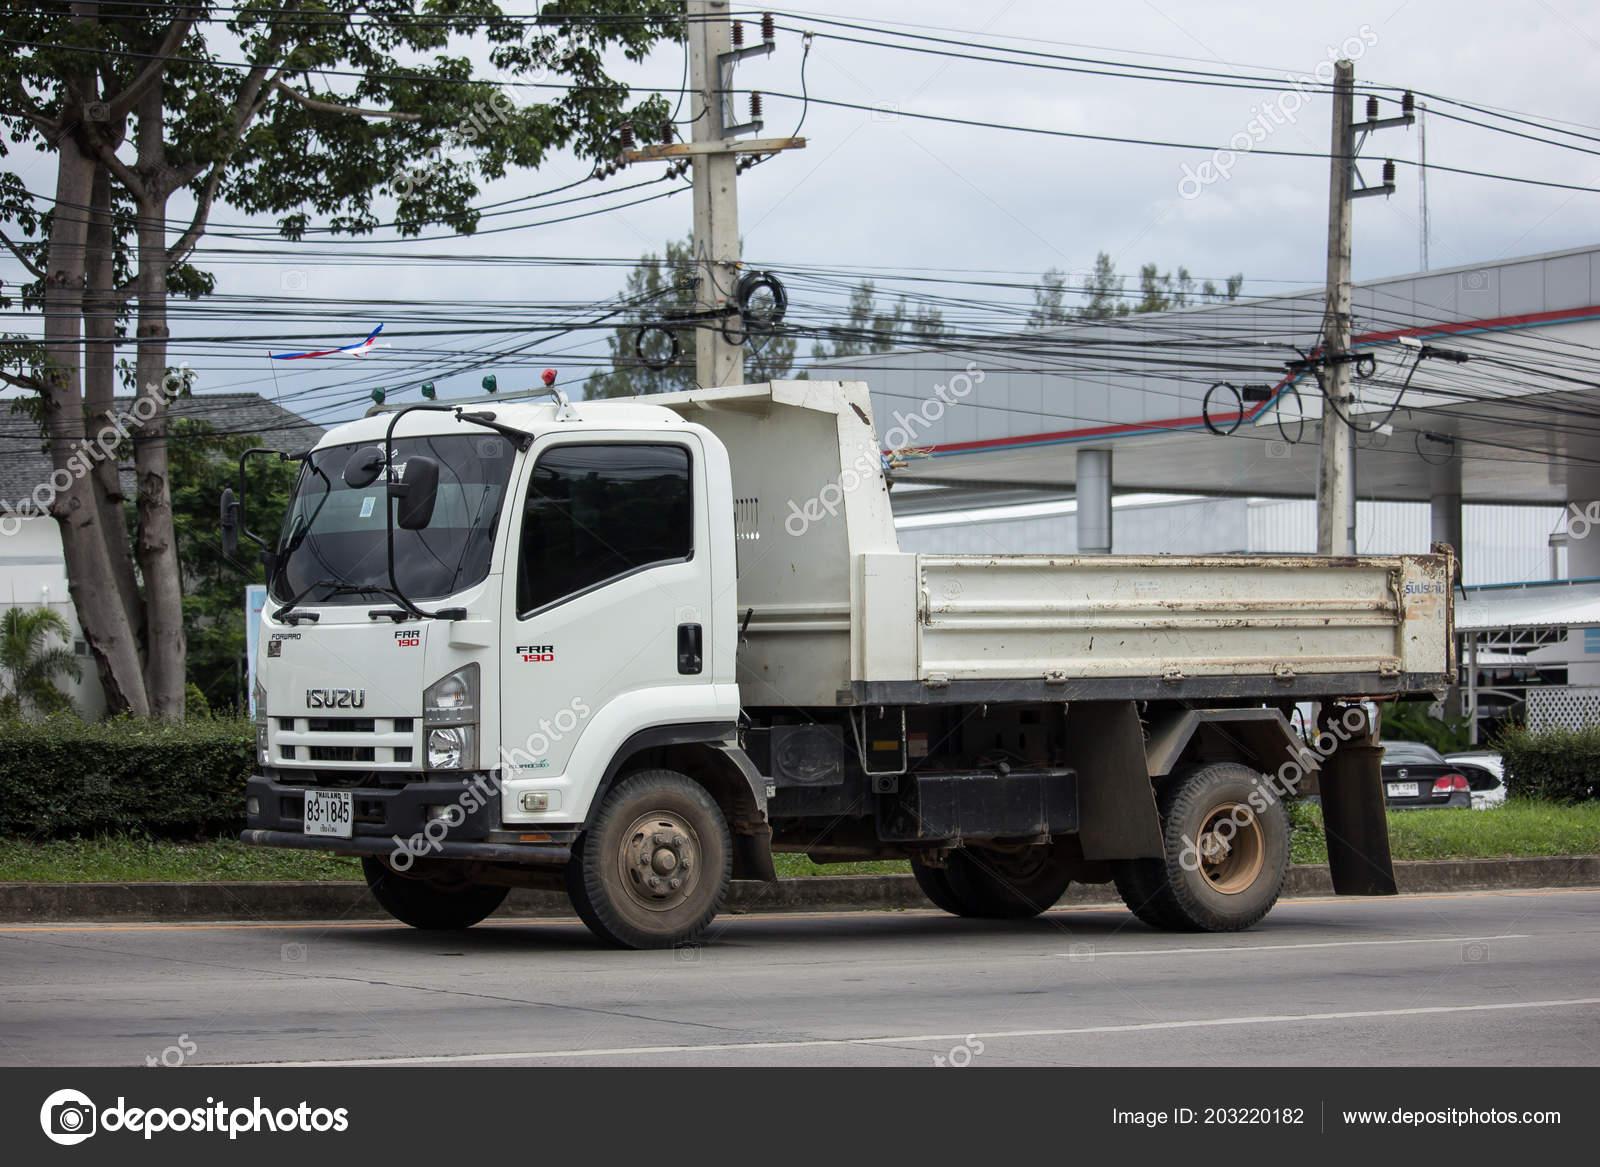 Chiangmai Thailand June 2018 Private Isuzu Dump Truck Road 1001 U2014  Fotografia De Stock